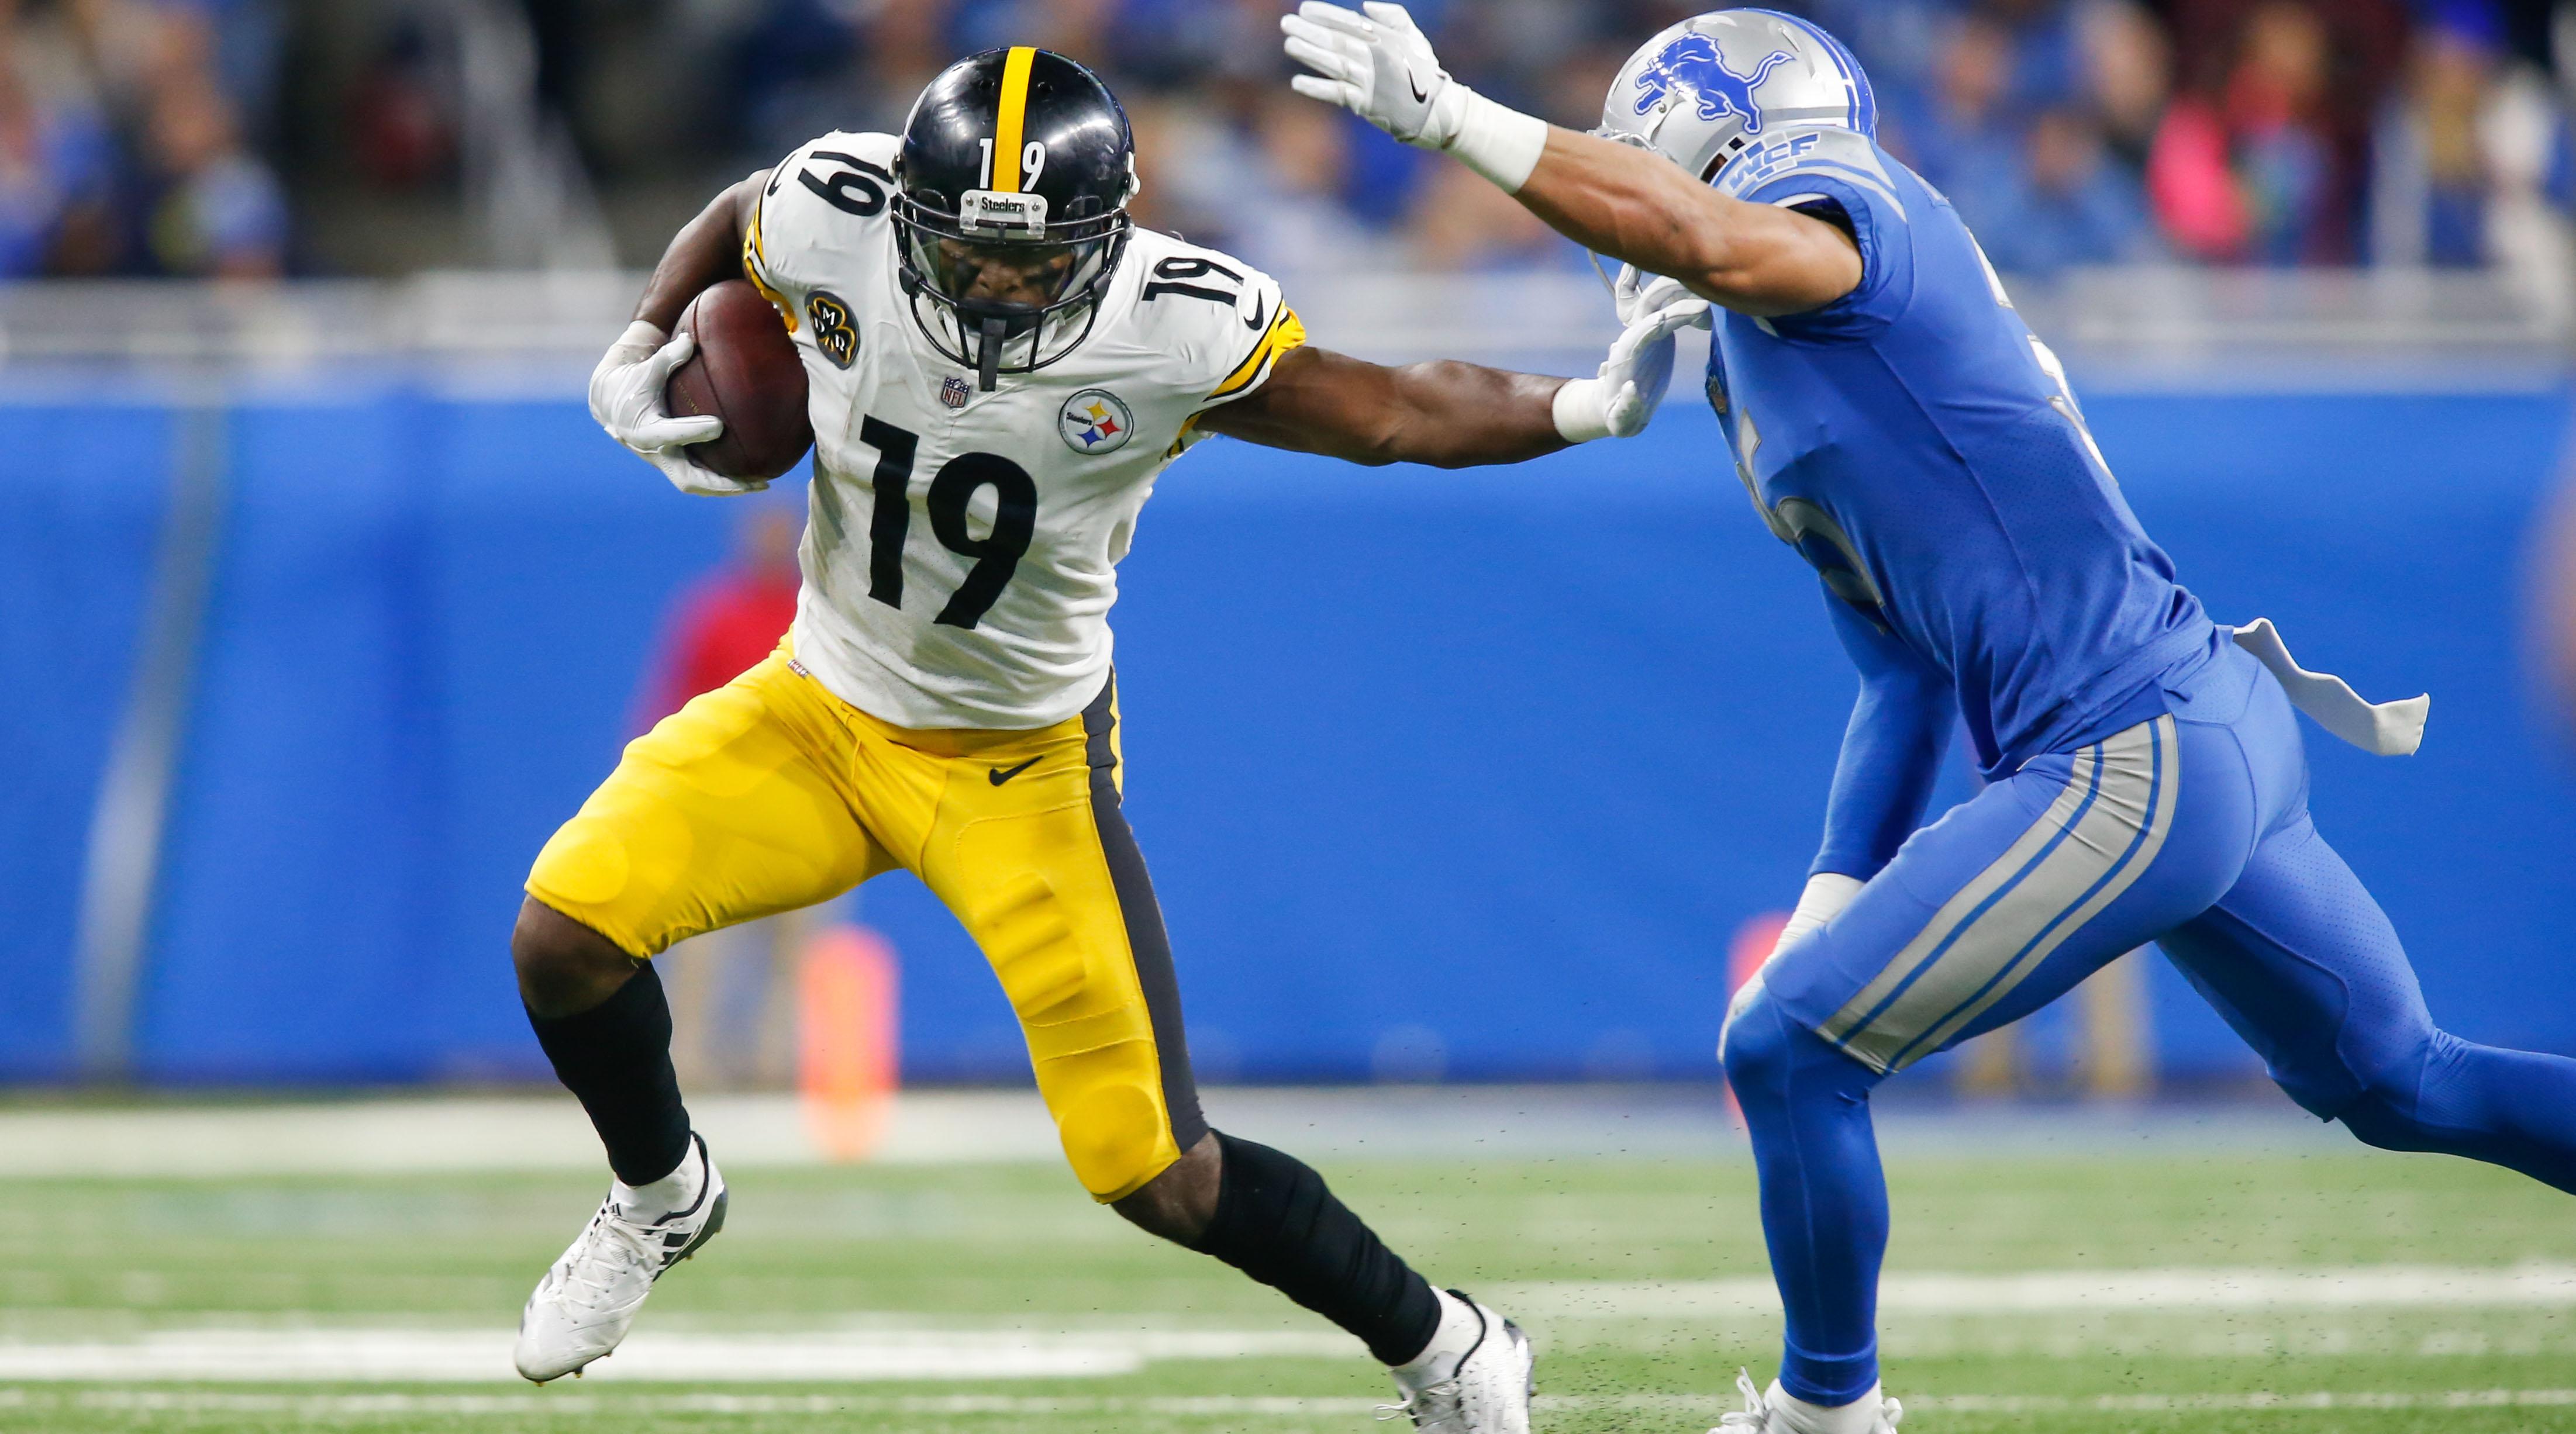 Juju Smith Schuster >> JuJu Smith-Schuster: Steelers WR talks fantasy football and Madden | SI.com